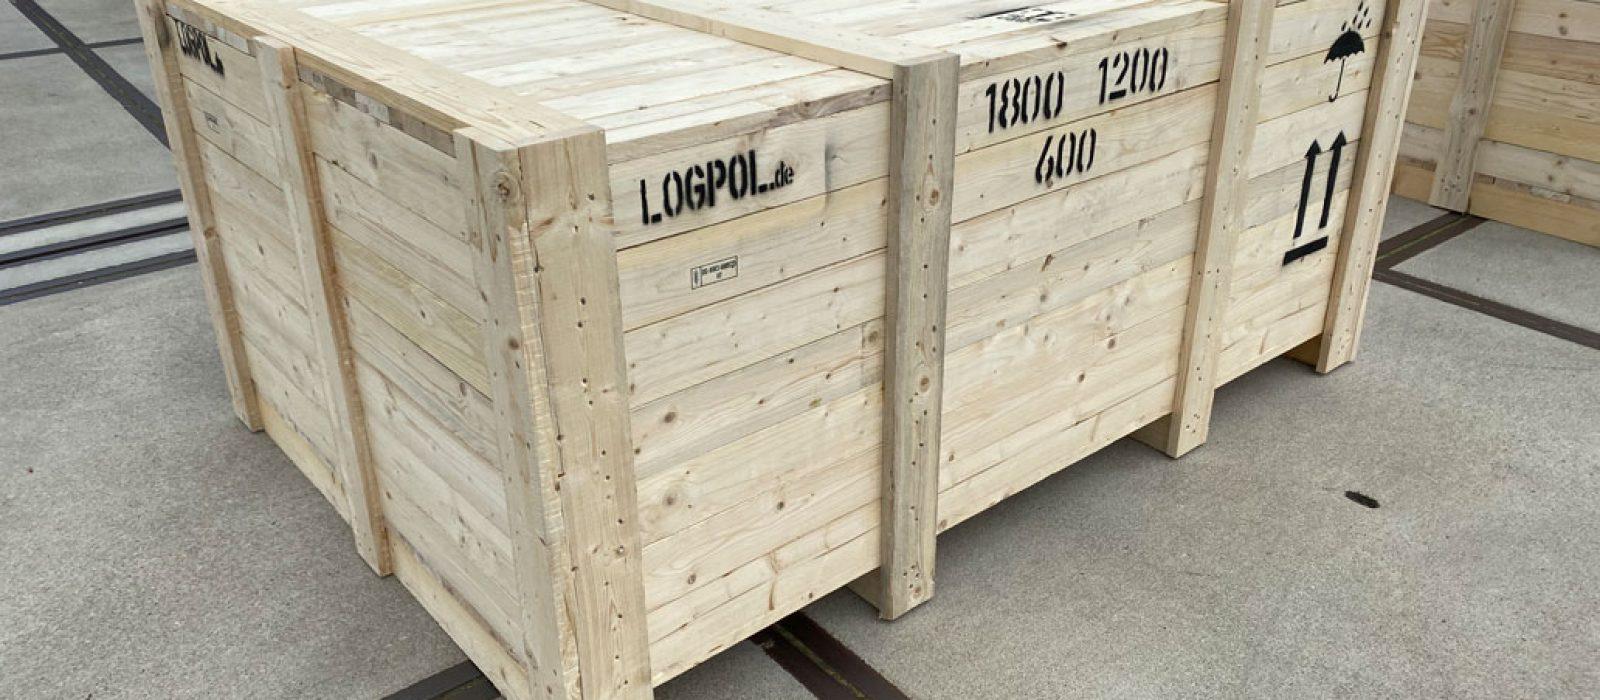 Holzkiste-1800×1200-LOGPOL